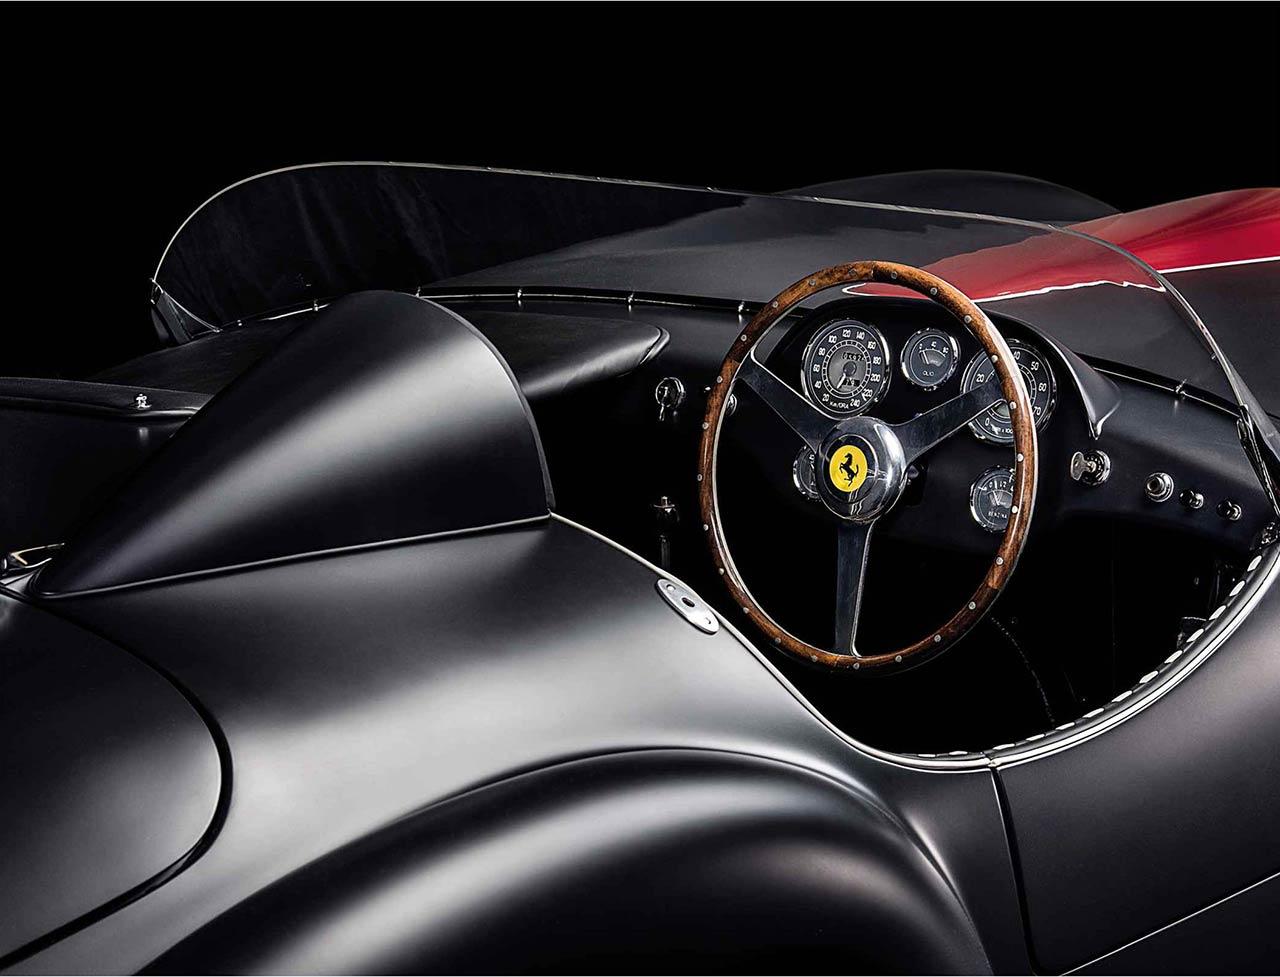 1953 Ferrari 166MM Barchetta interior